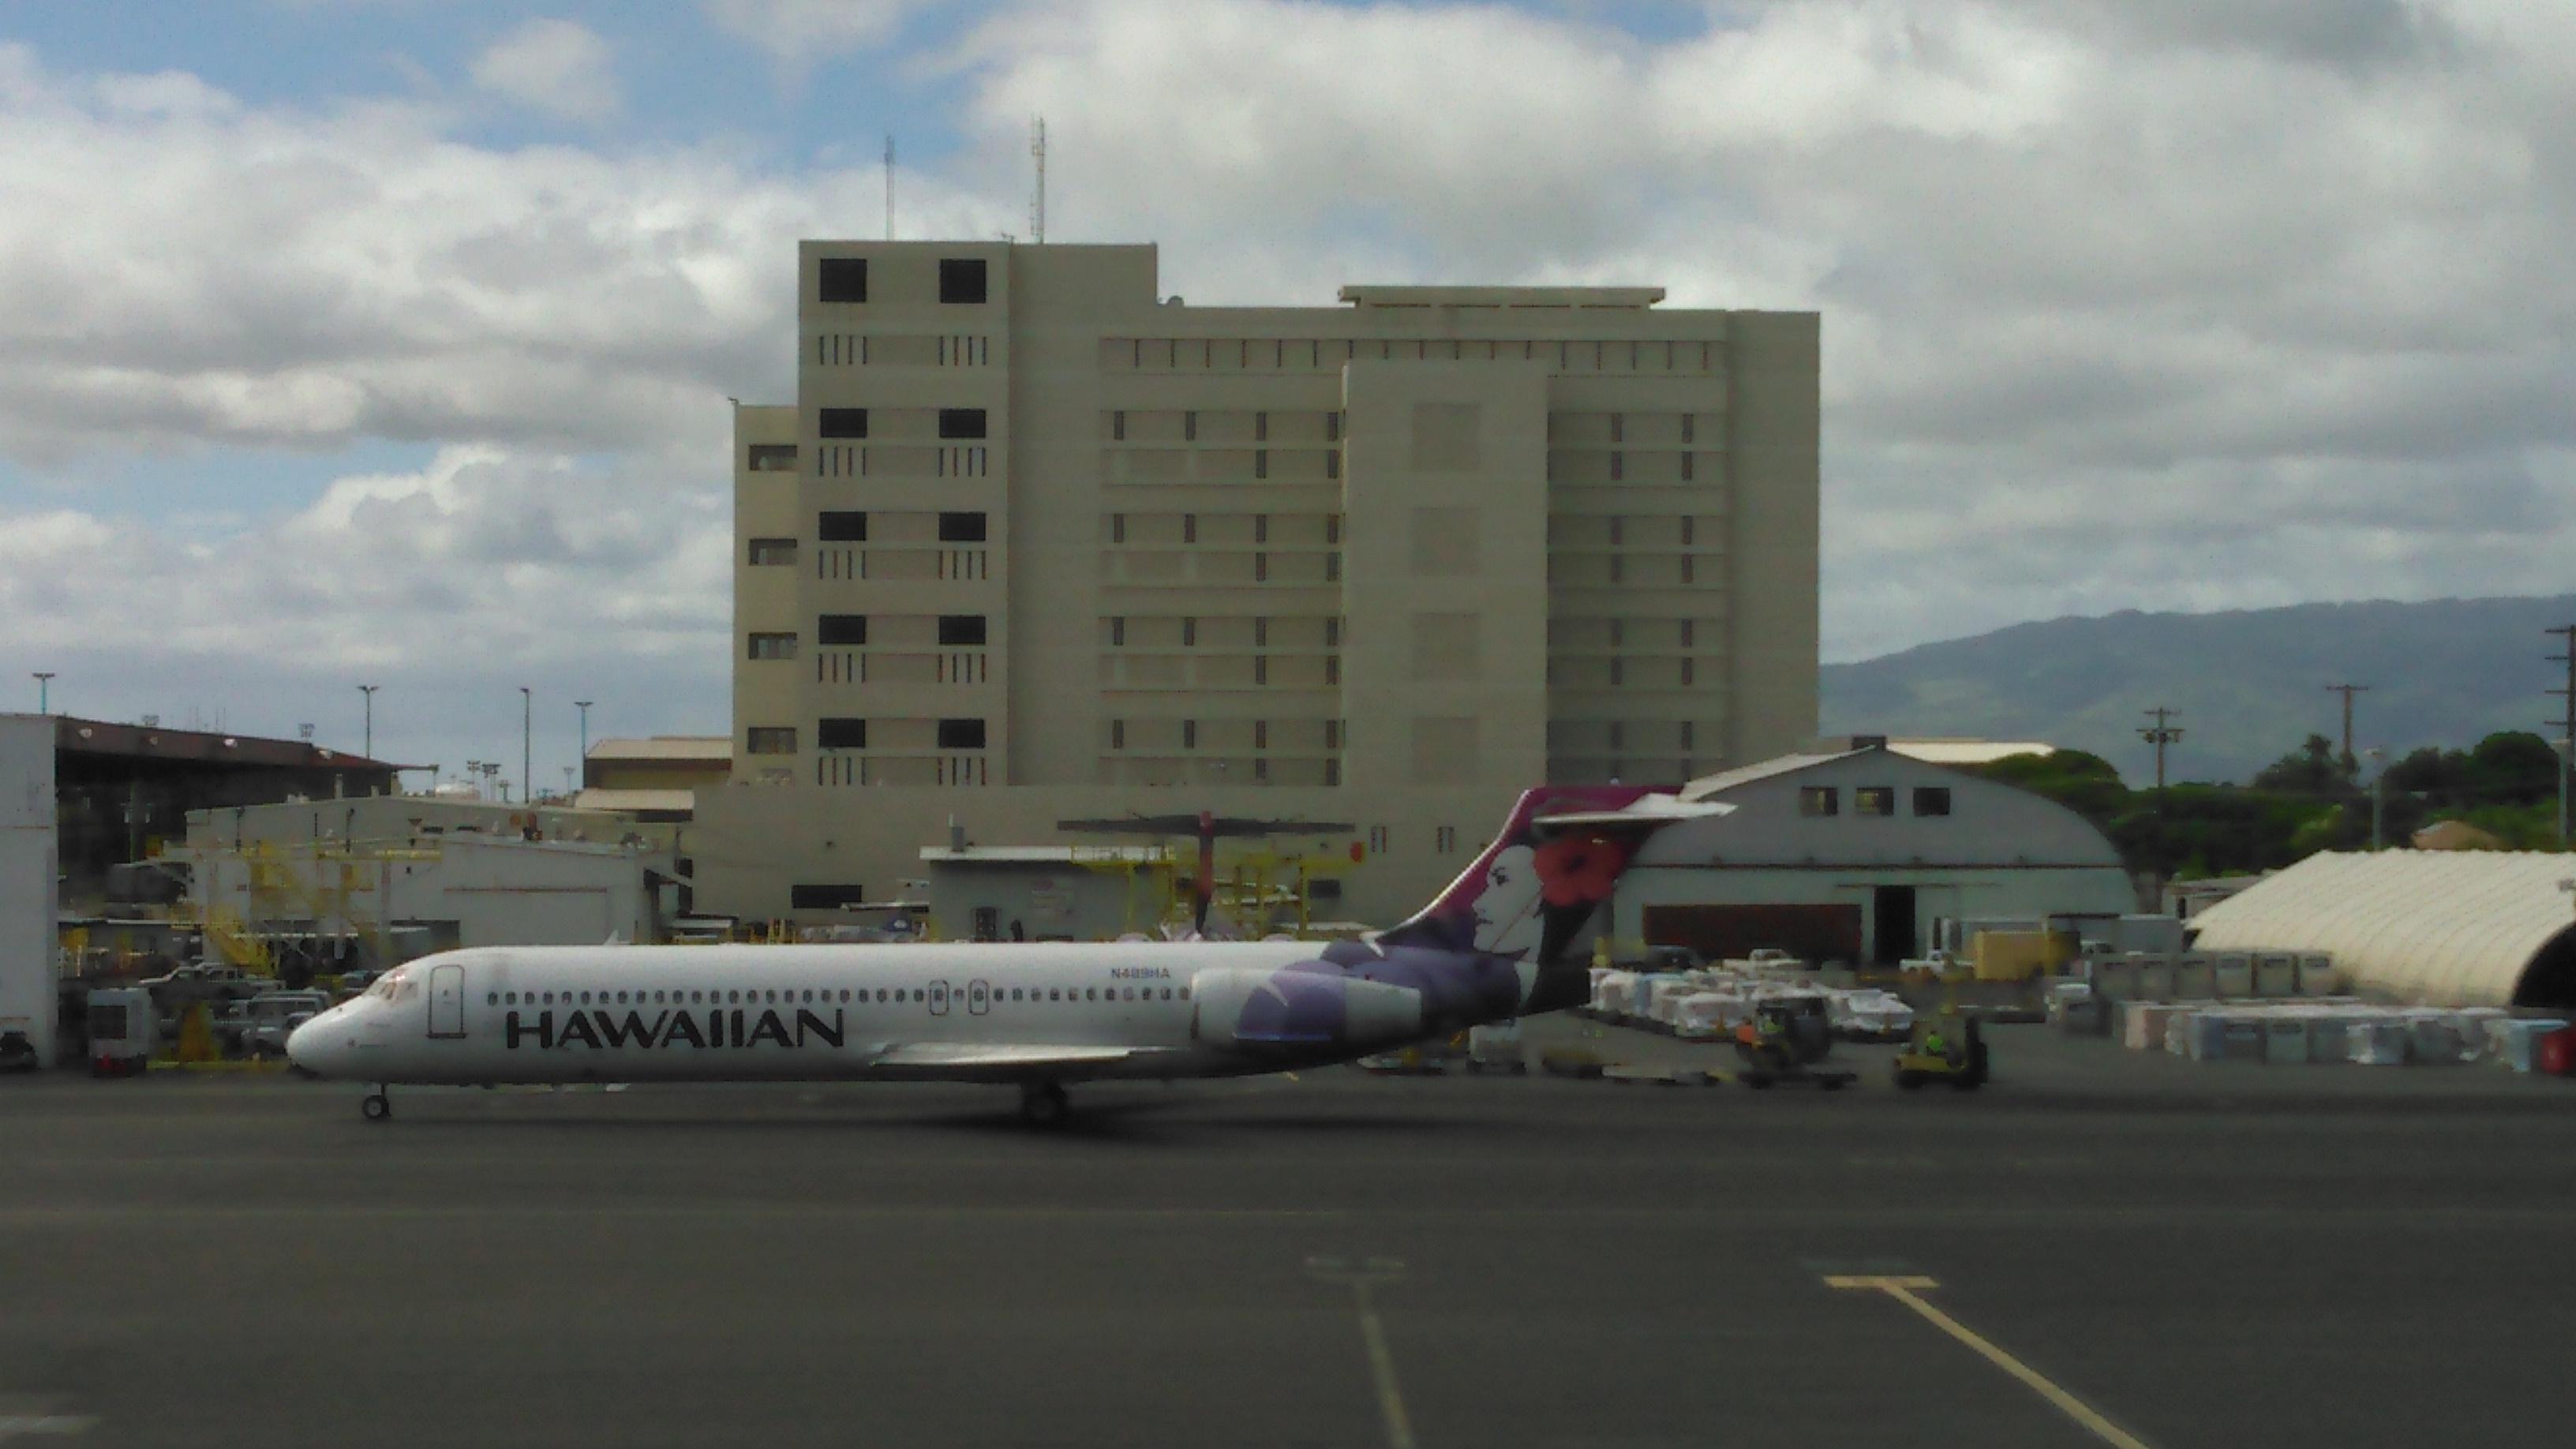 Federal Detention Center, Honolulu - Wikipedia